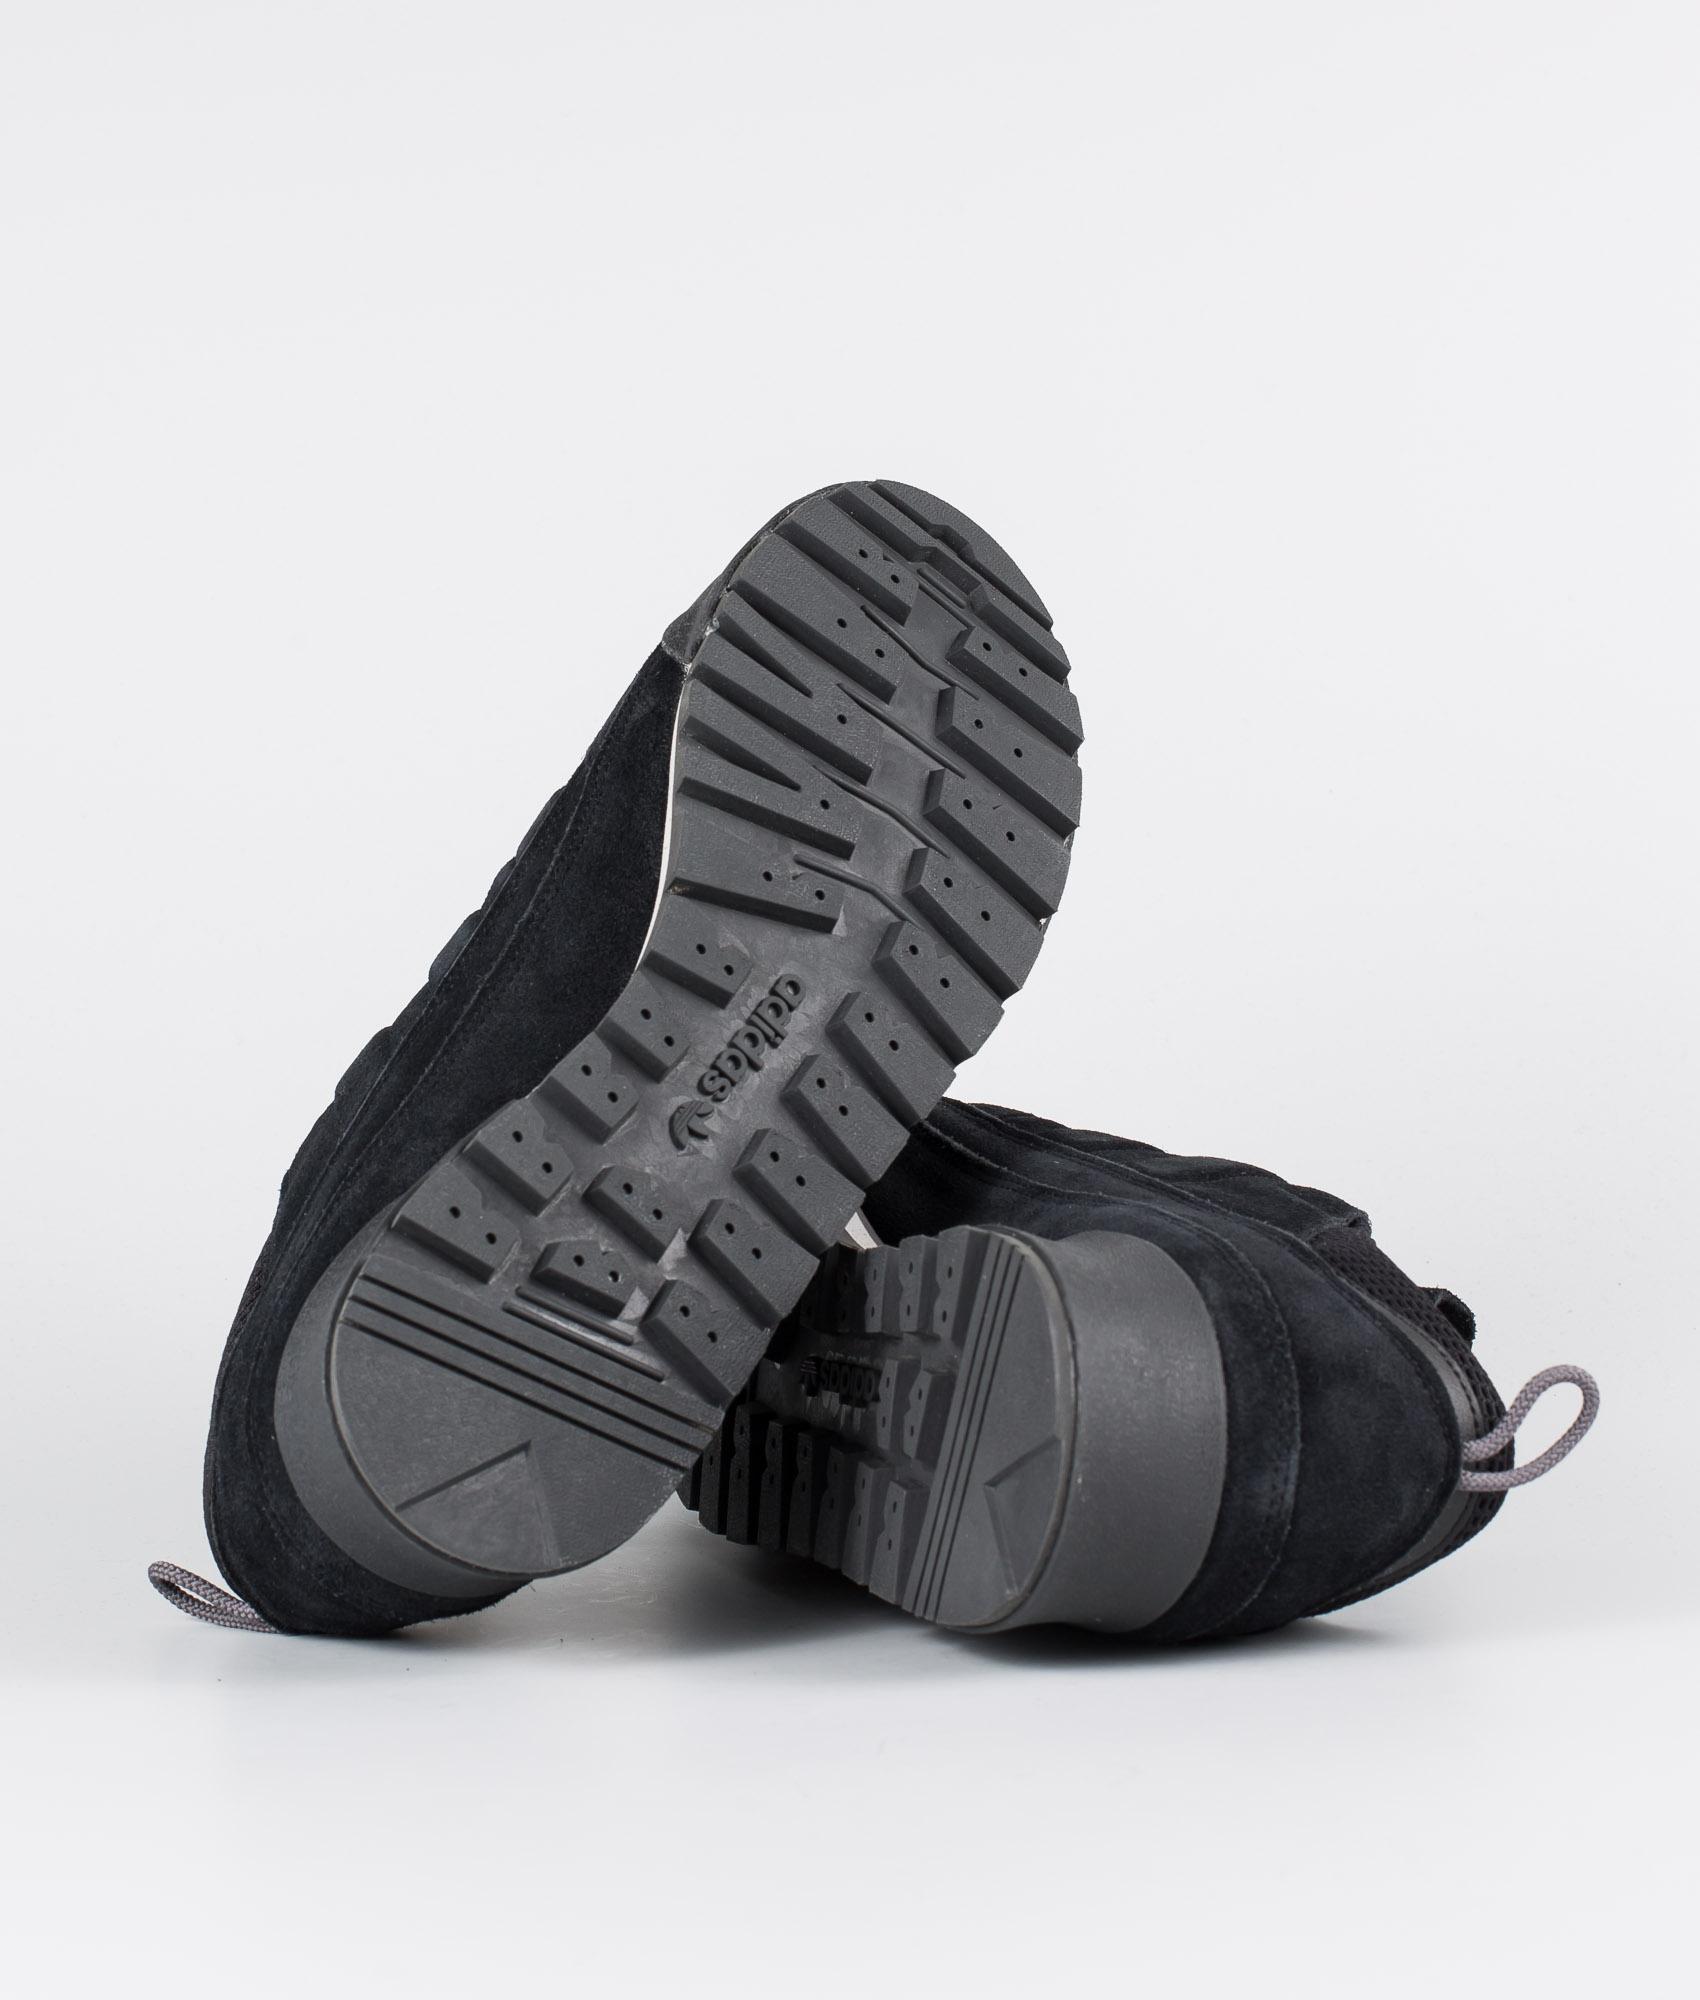 Adidas Snowboarding Jake Boot 2.0 Low Sko Core BlackCarbonGrey Five